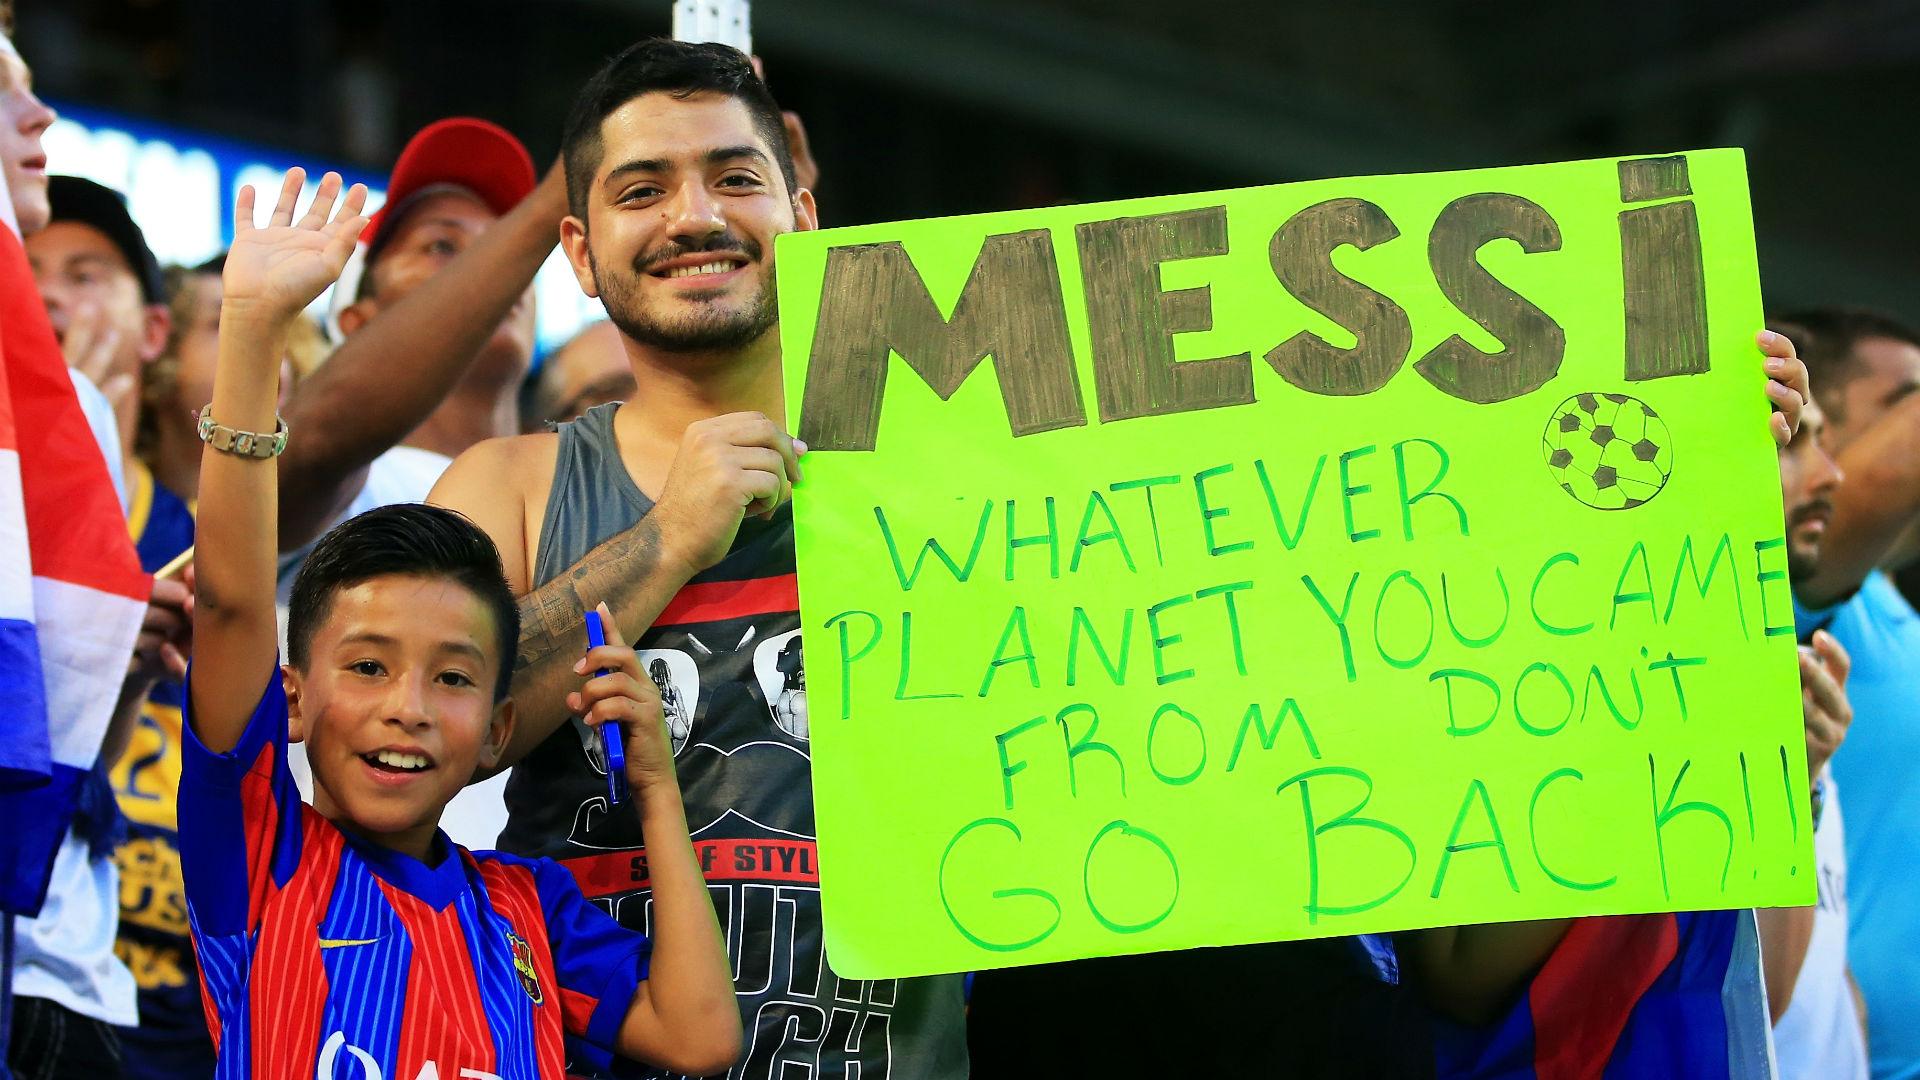 Opponent team fan spat in Lionel Messi 12/21/2015 82